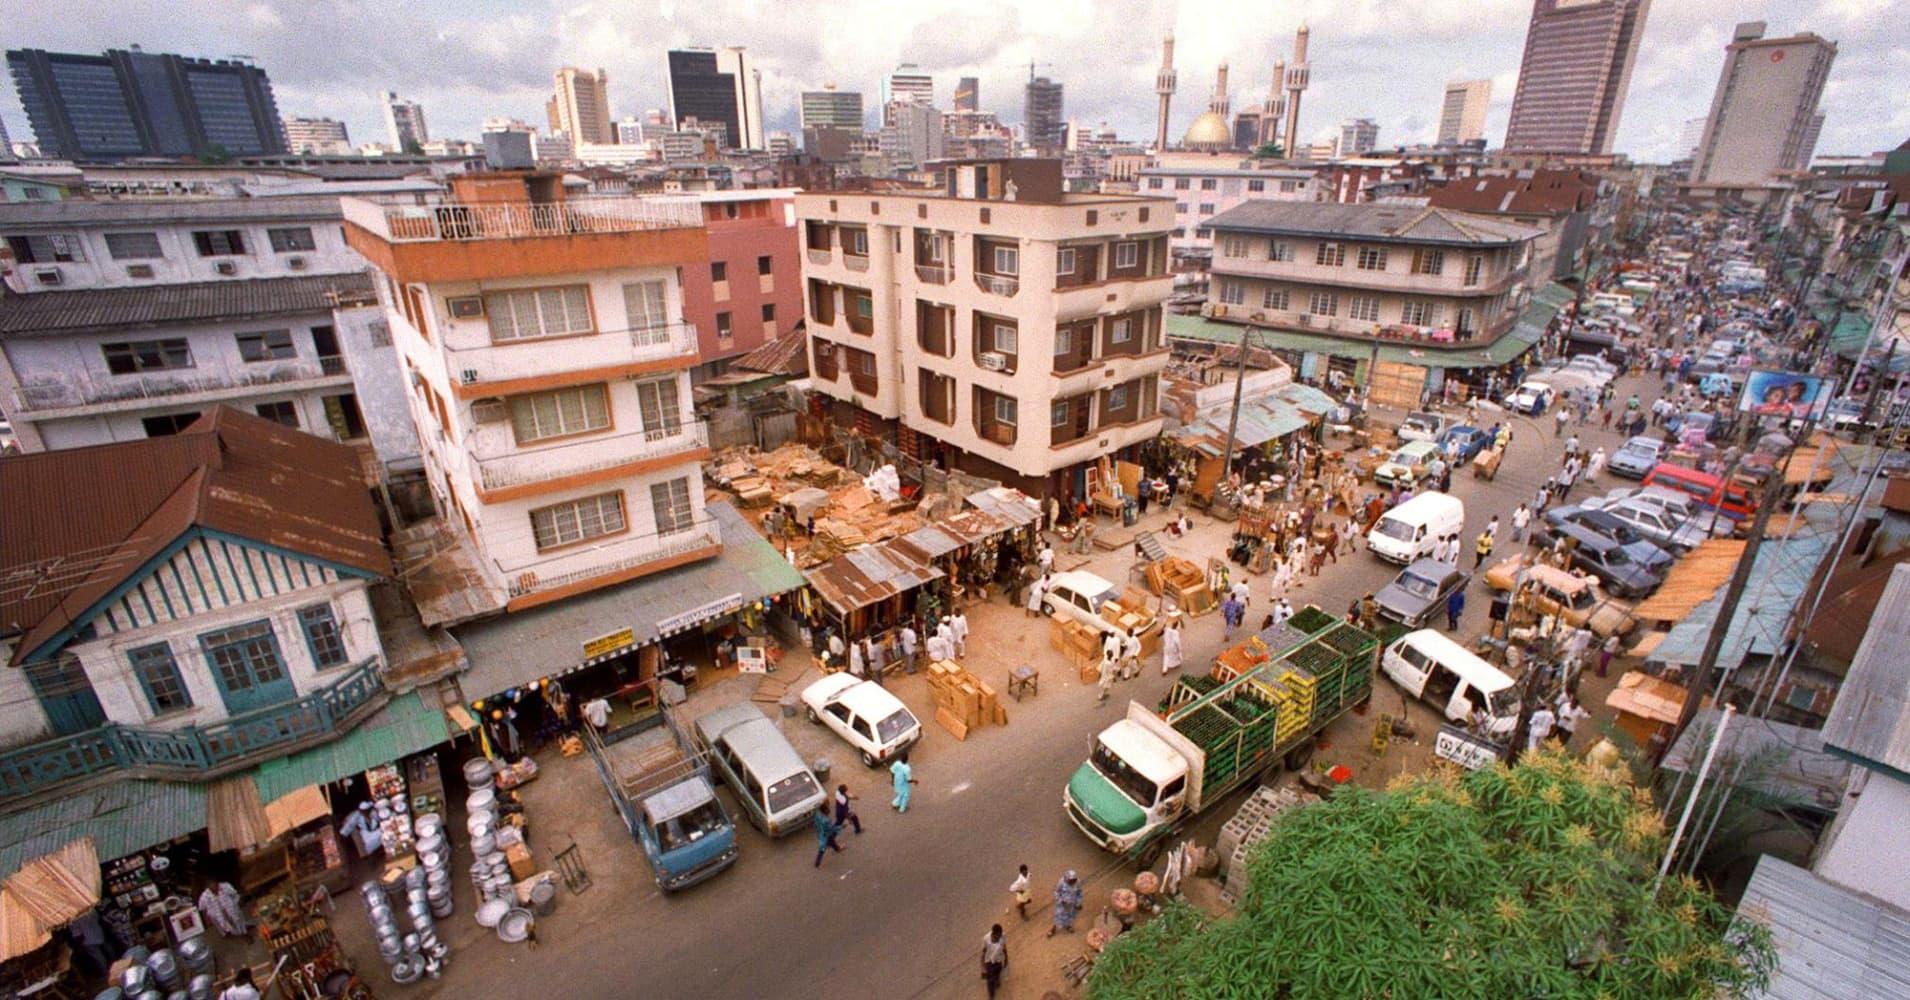 Jankara market, located on Lagos Island and the skyline of Lagos, Nigeria.